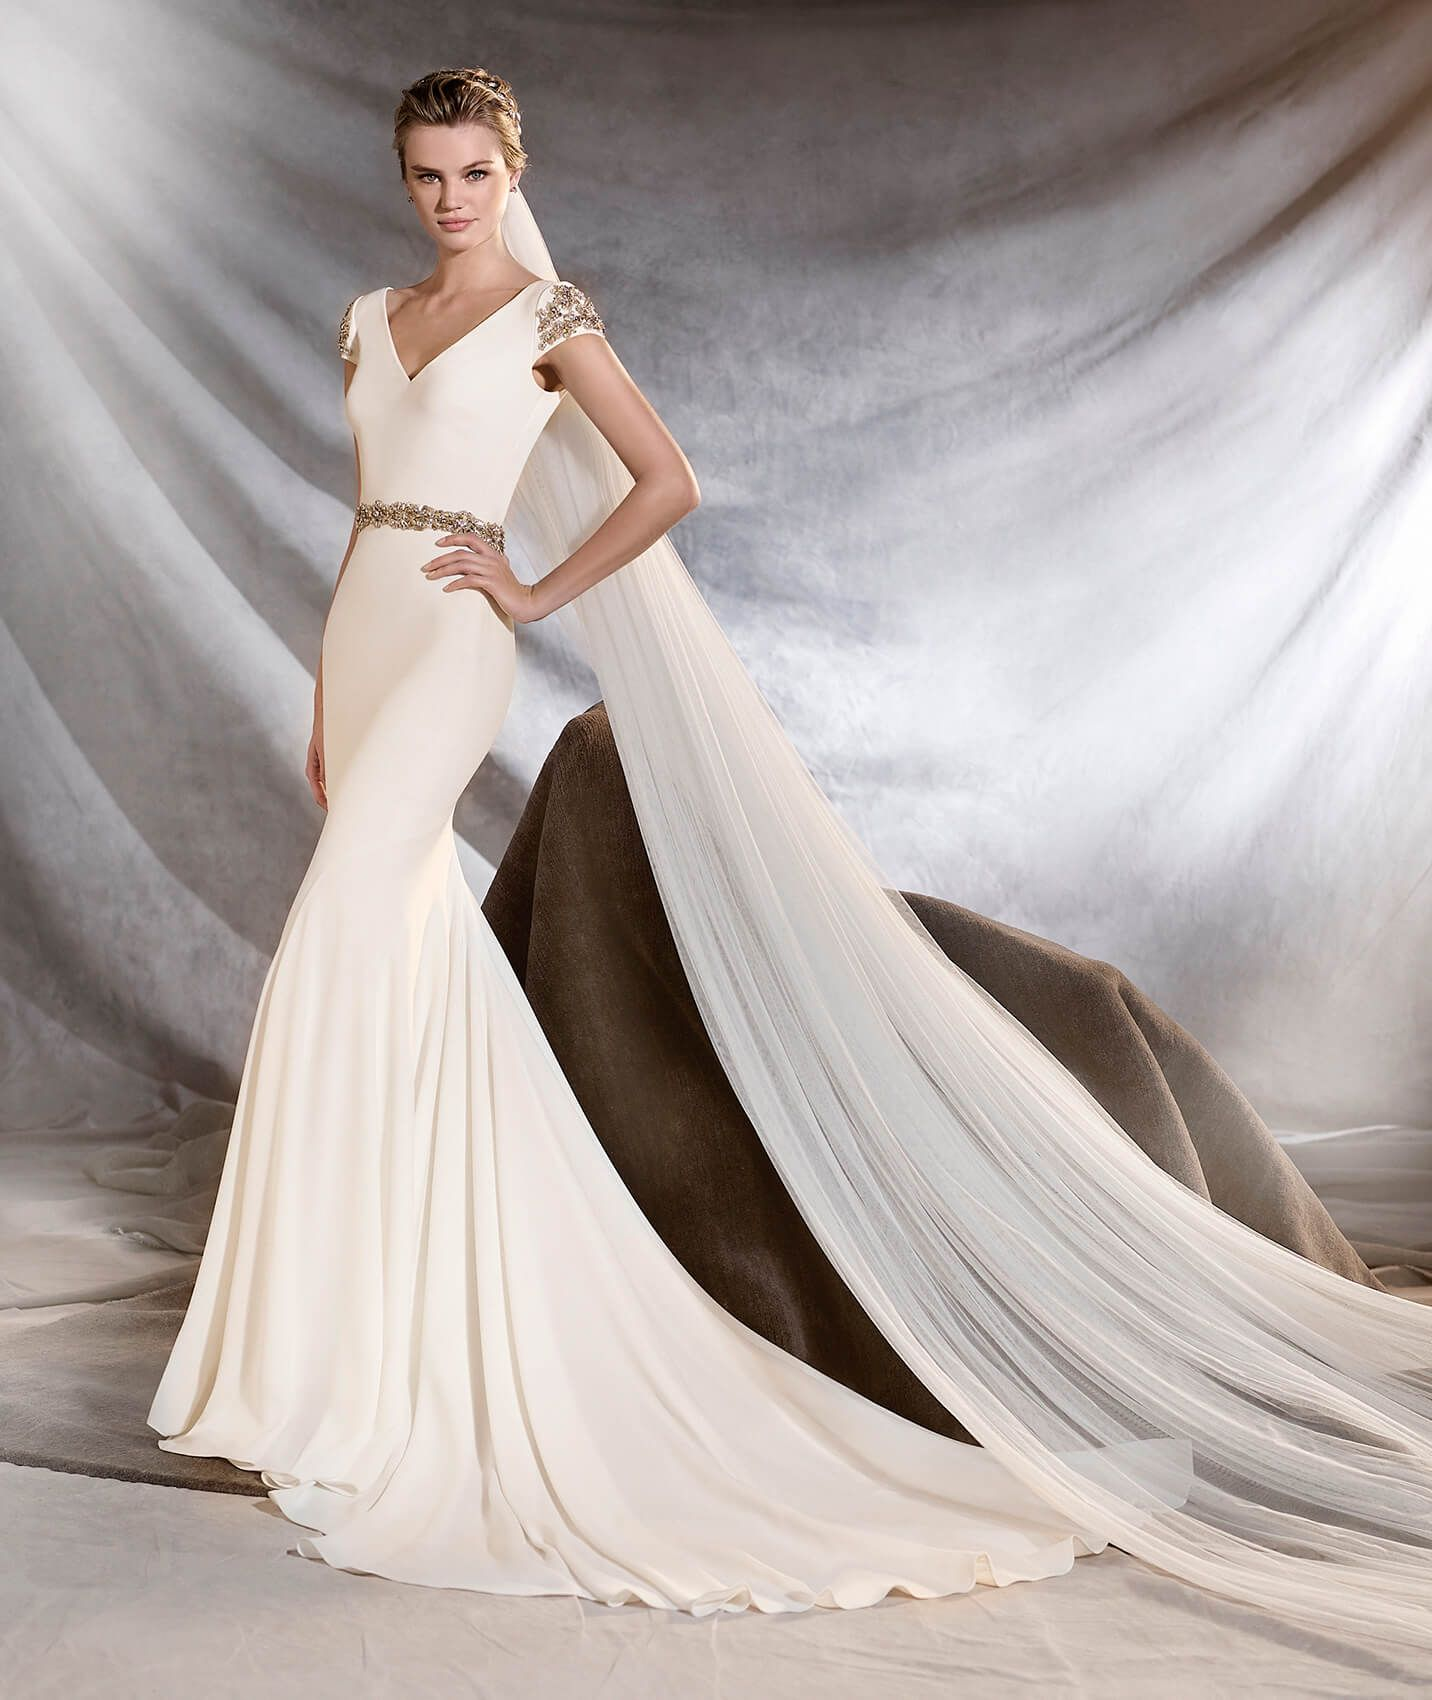 ORVILLE - Wedding dress with v neck   Pinterest   Mermaid, Wedding ...